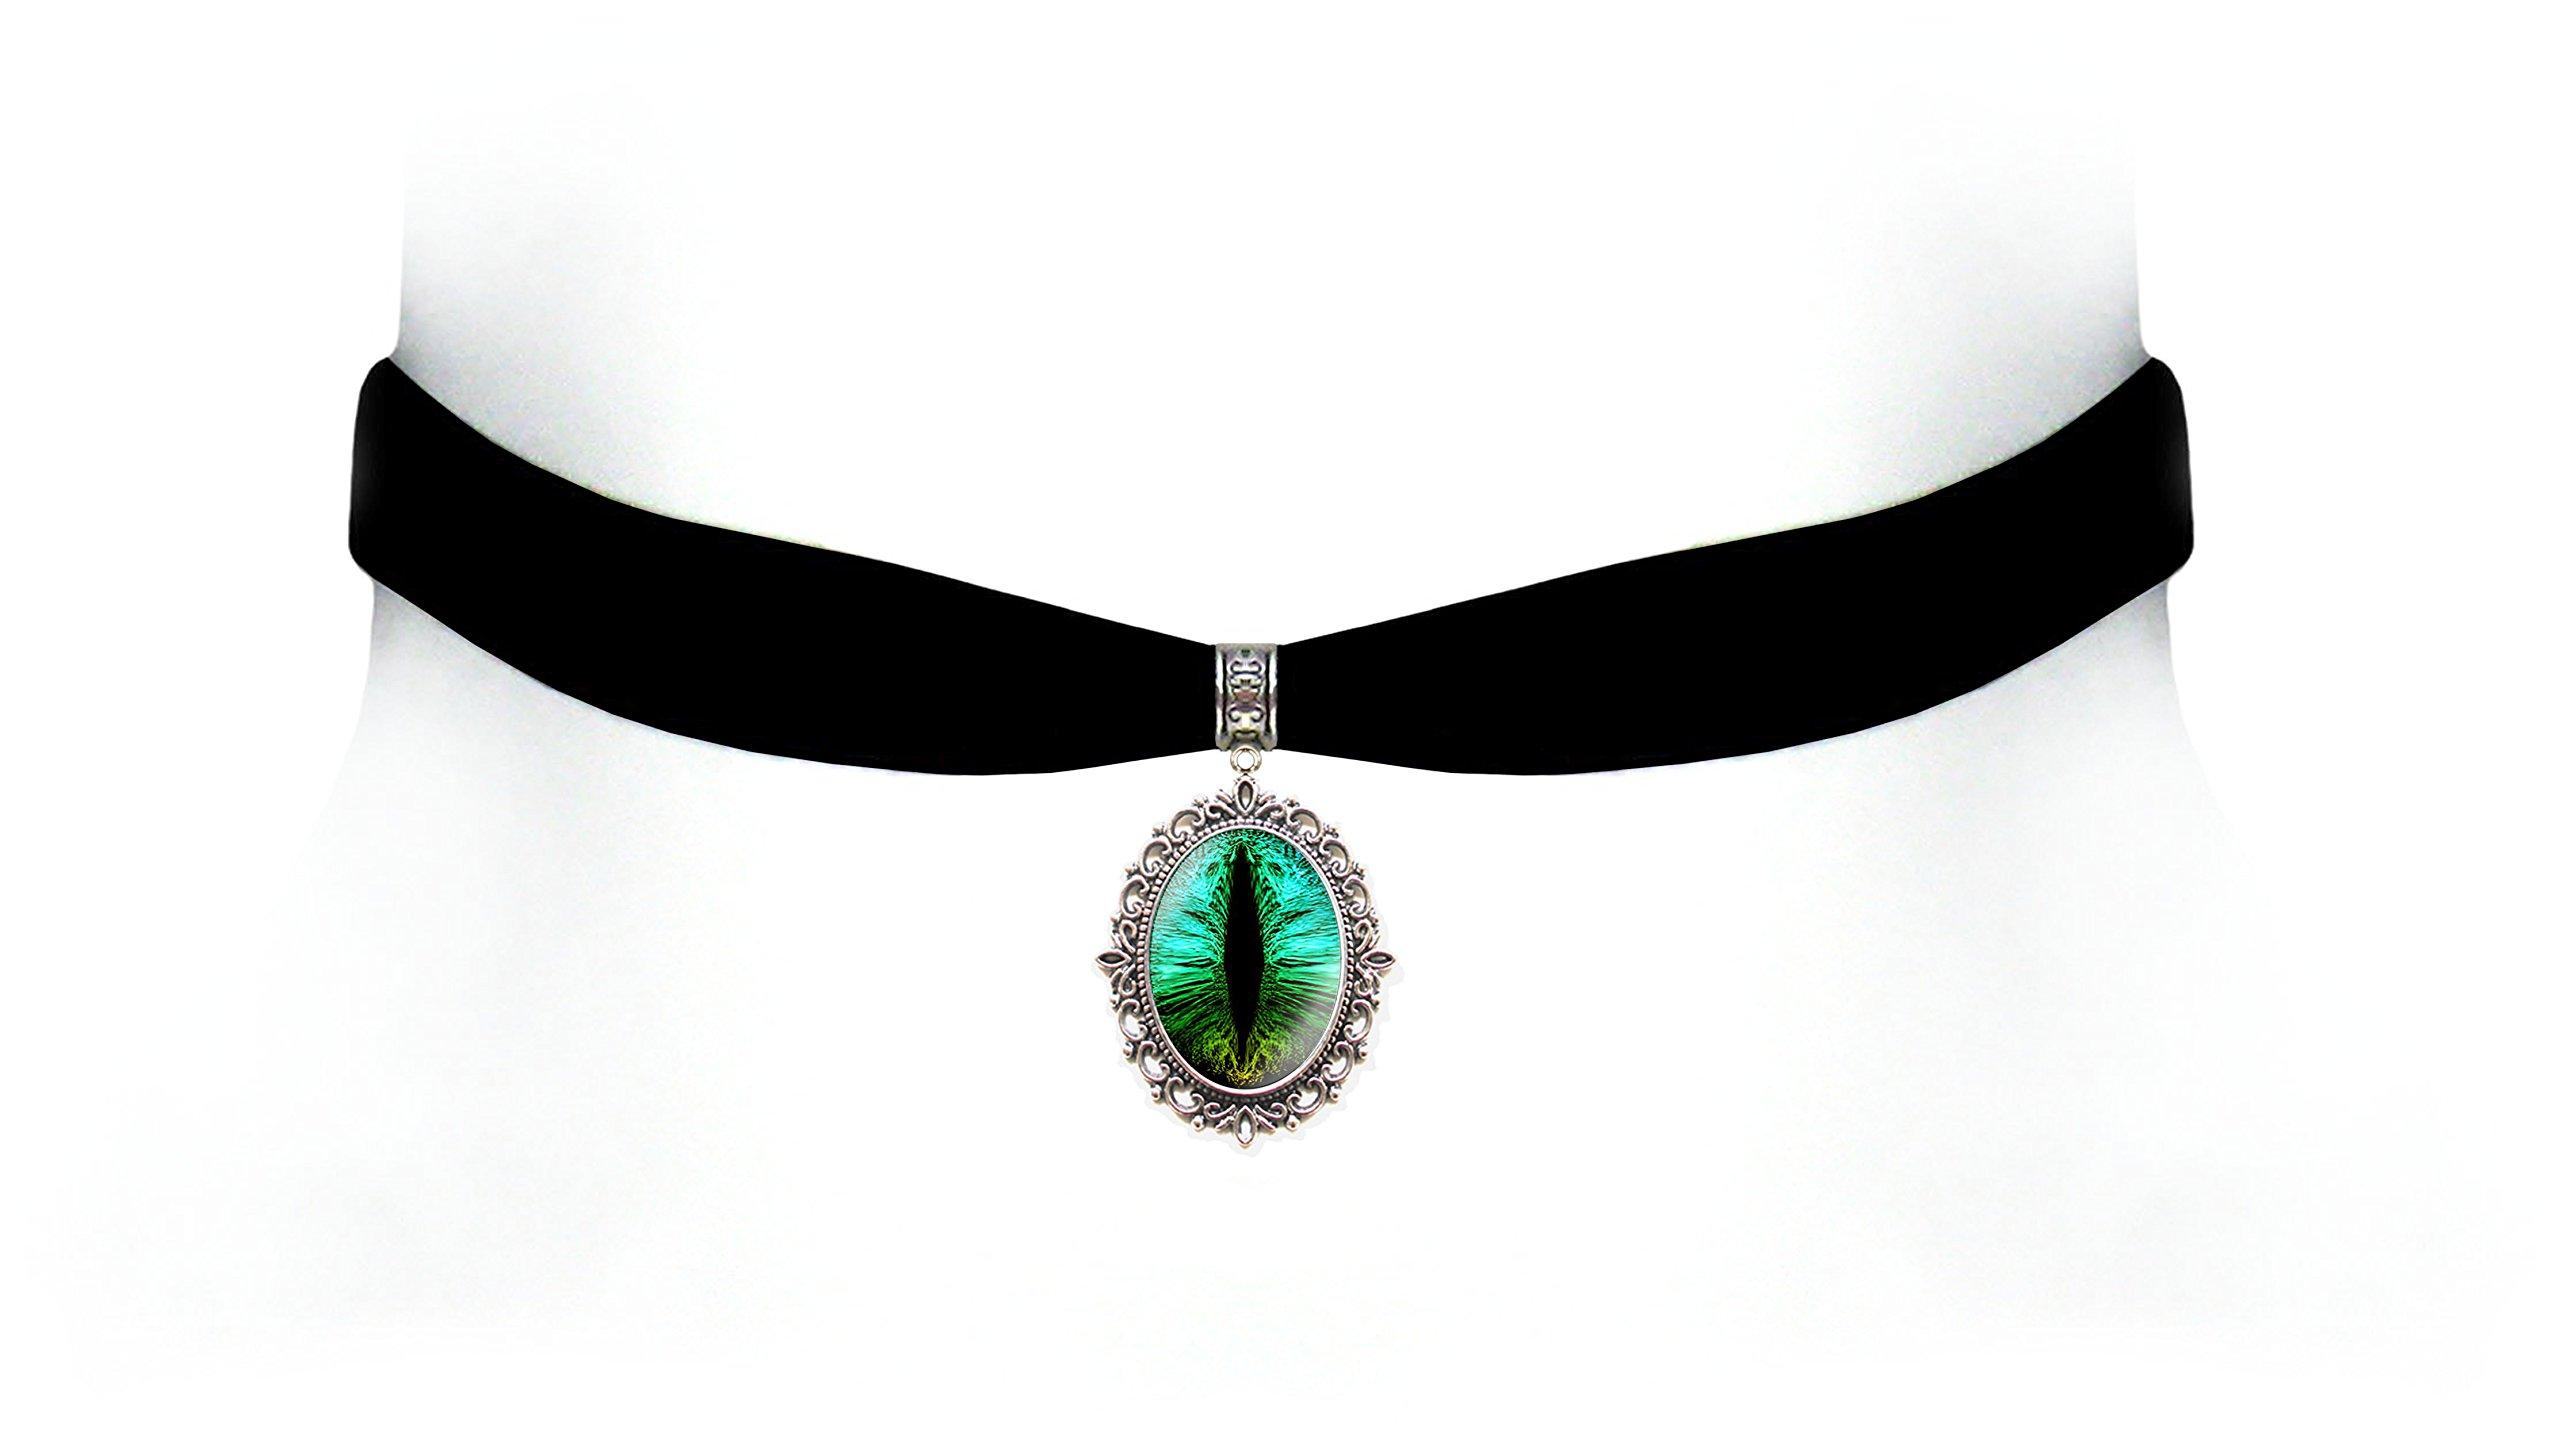 Victorian Vault Black Velvet Dragon Eye Choker Steampunk Gothic Pendant Necklace (Green Rainbow)